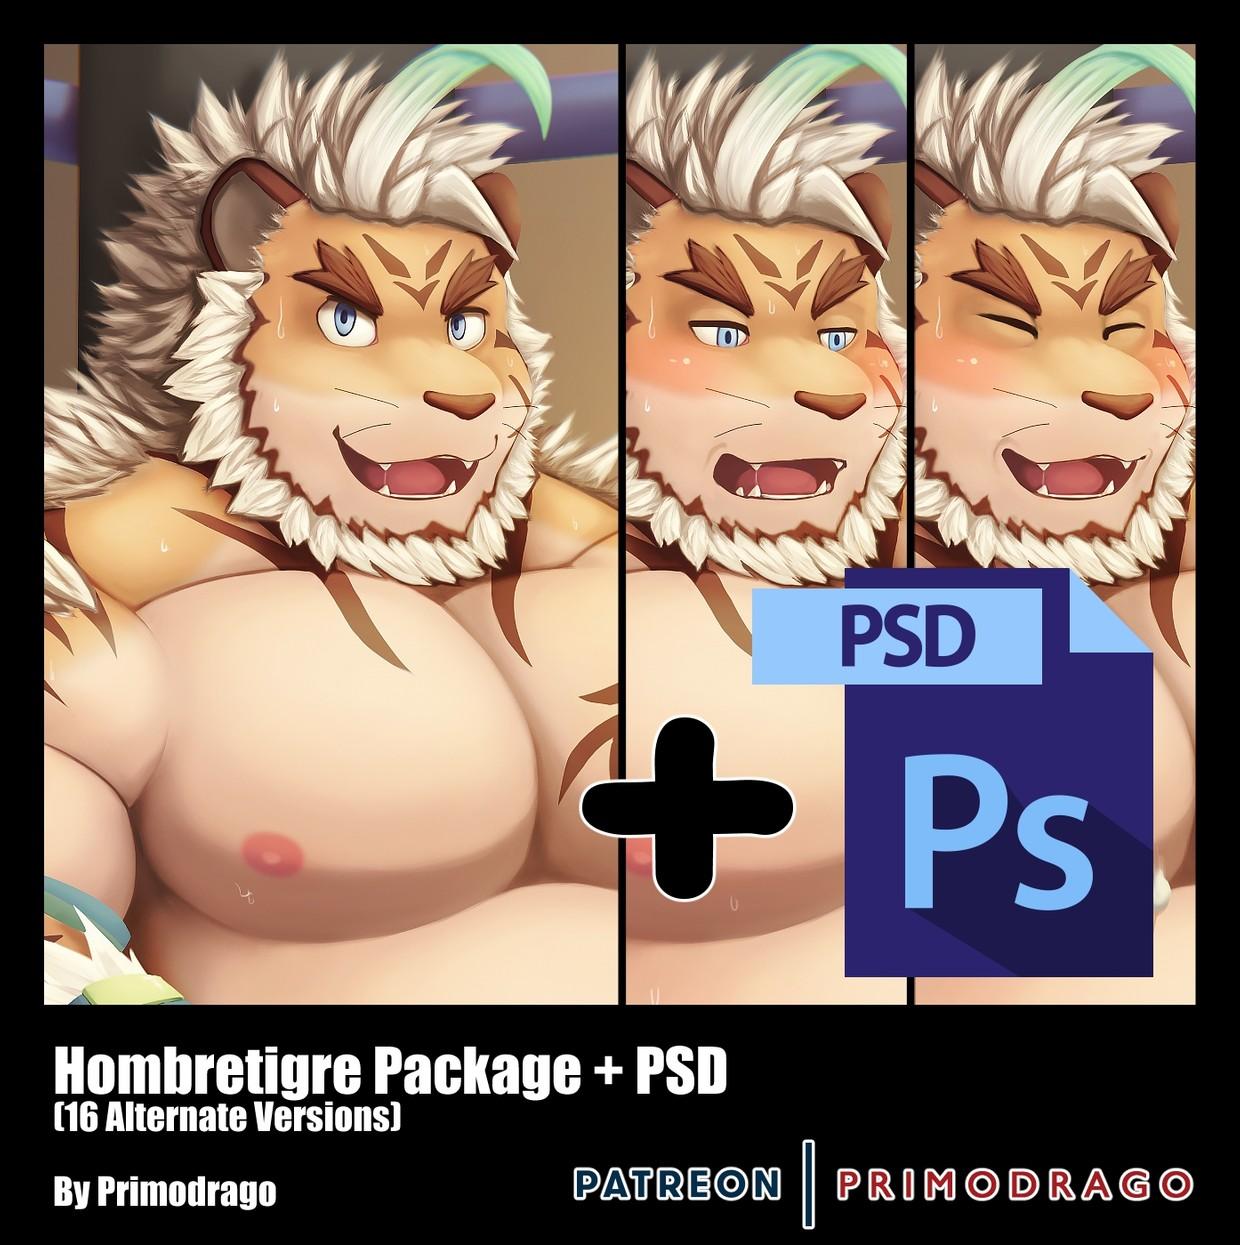 Hombretigre Artpack + PSD File